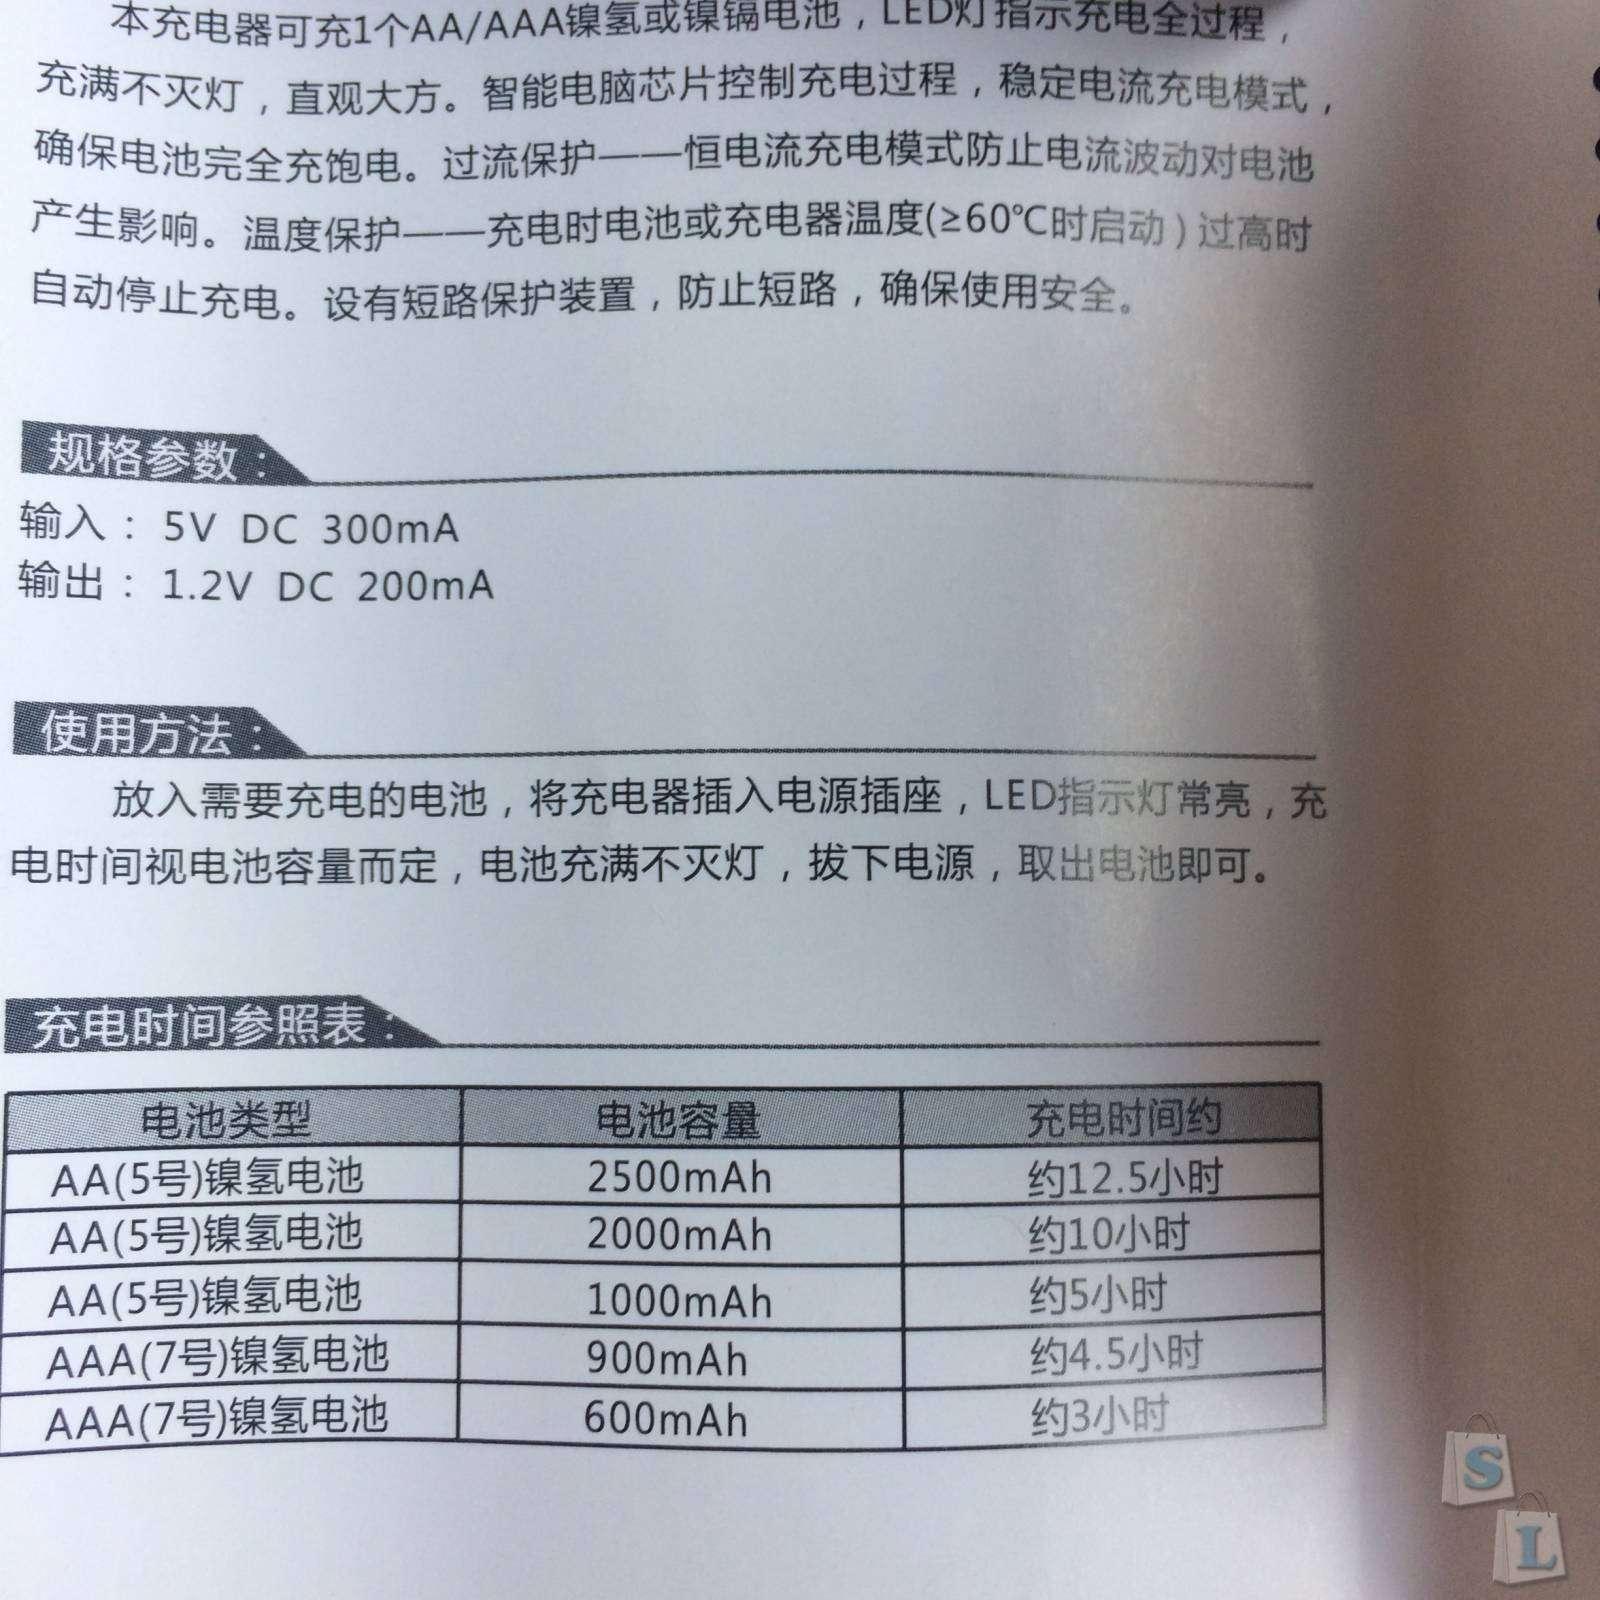 Aliexpress: зарядное АА - ААА на 1,2v